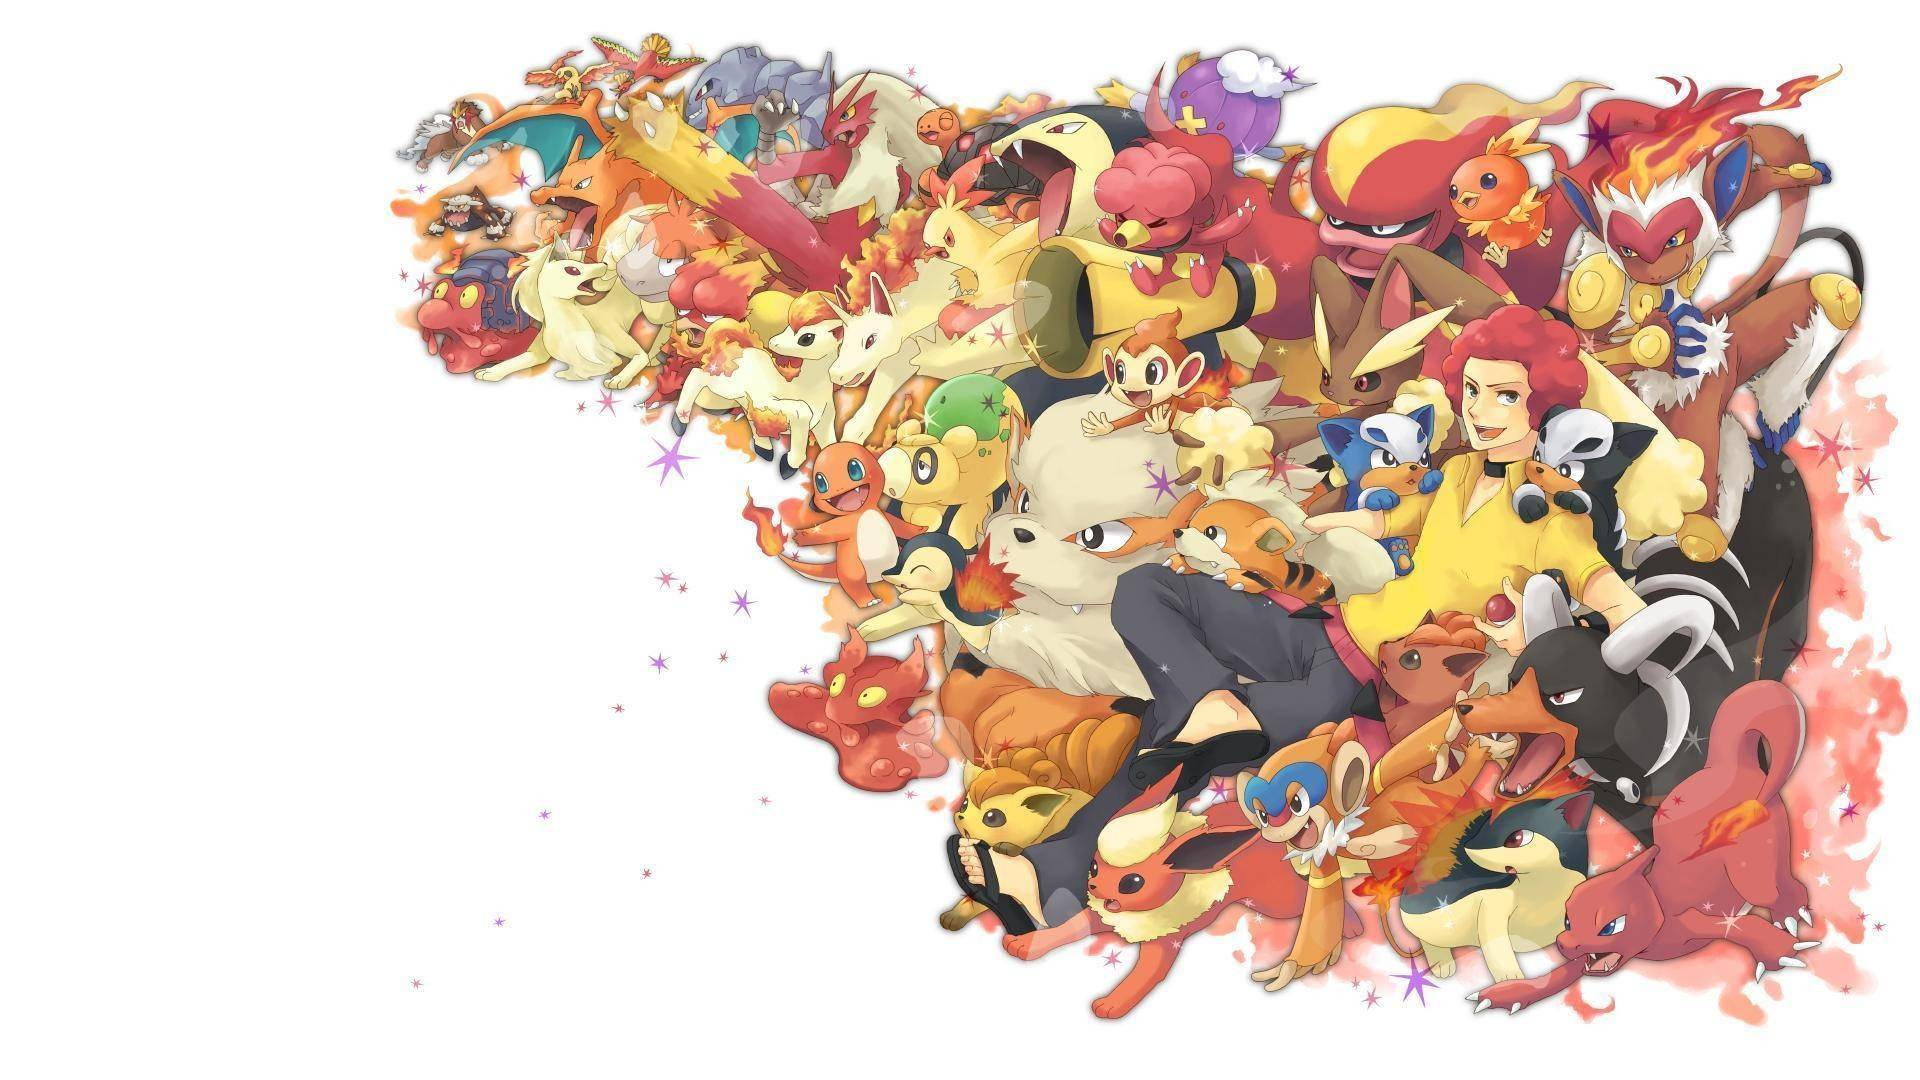 Pokemon Anime Wallpapers 1920x1080